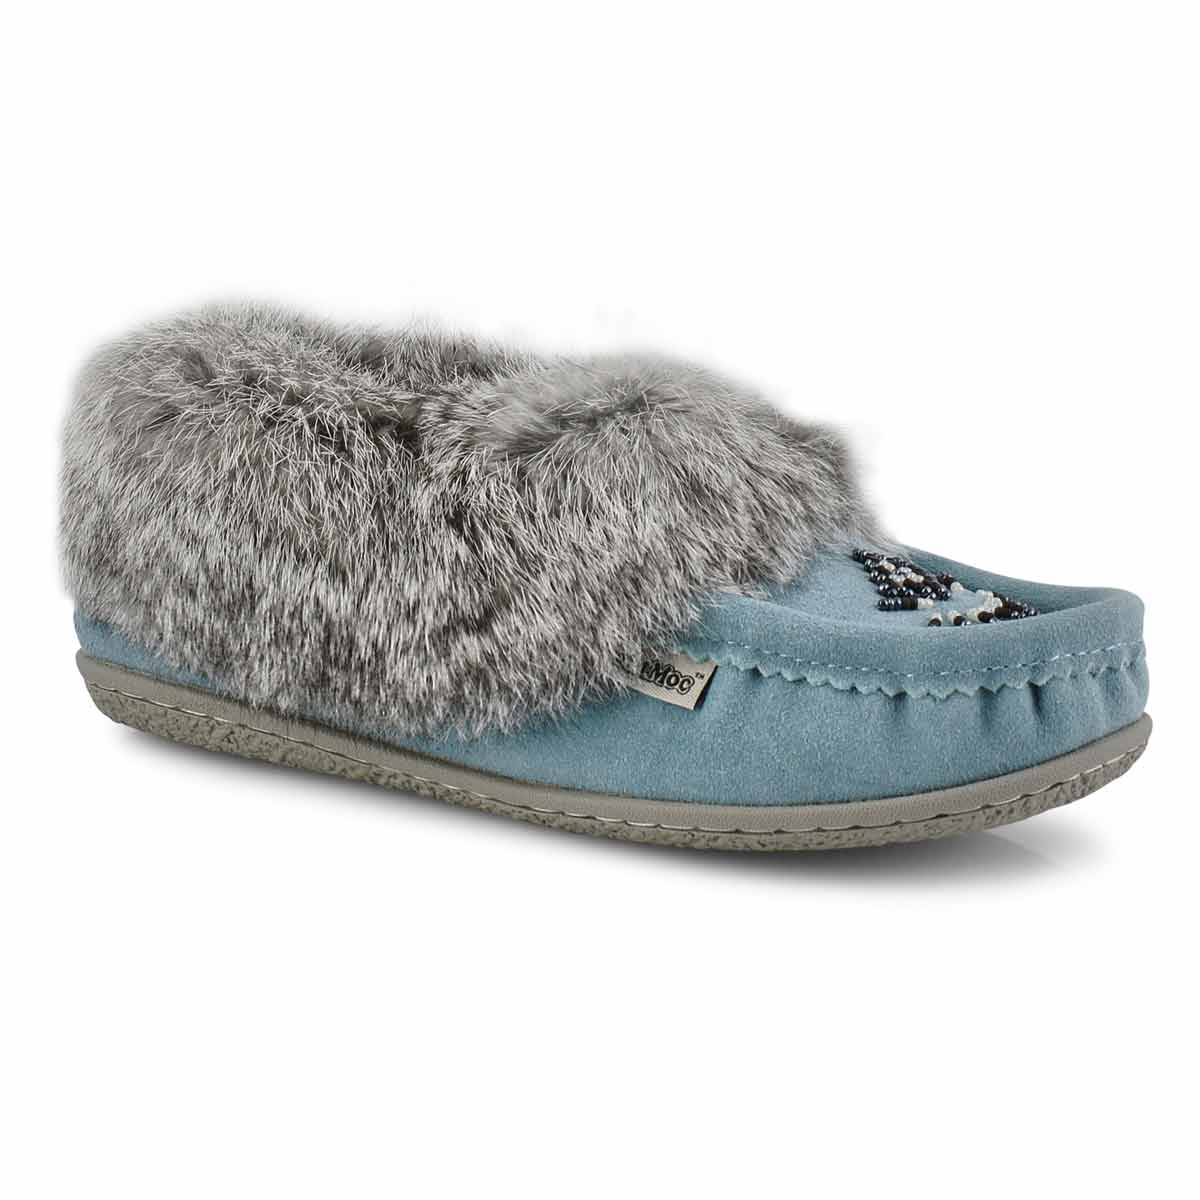 Women's Cute 5 Rabbit Fur Moccasin - Blue